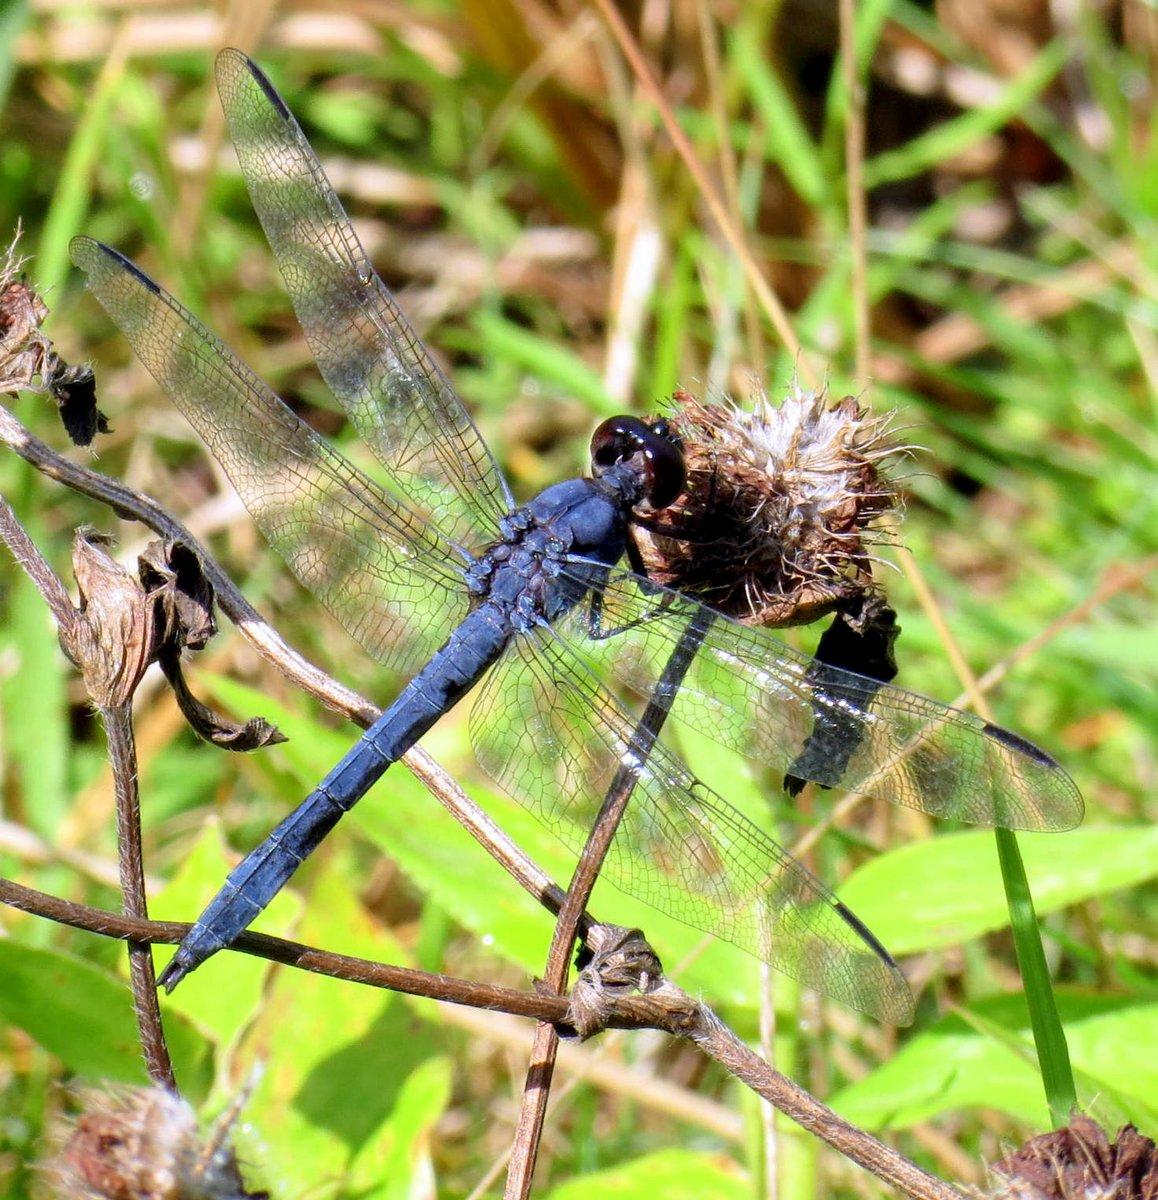 1. Blue Dragonfly